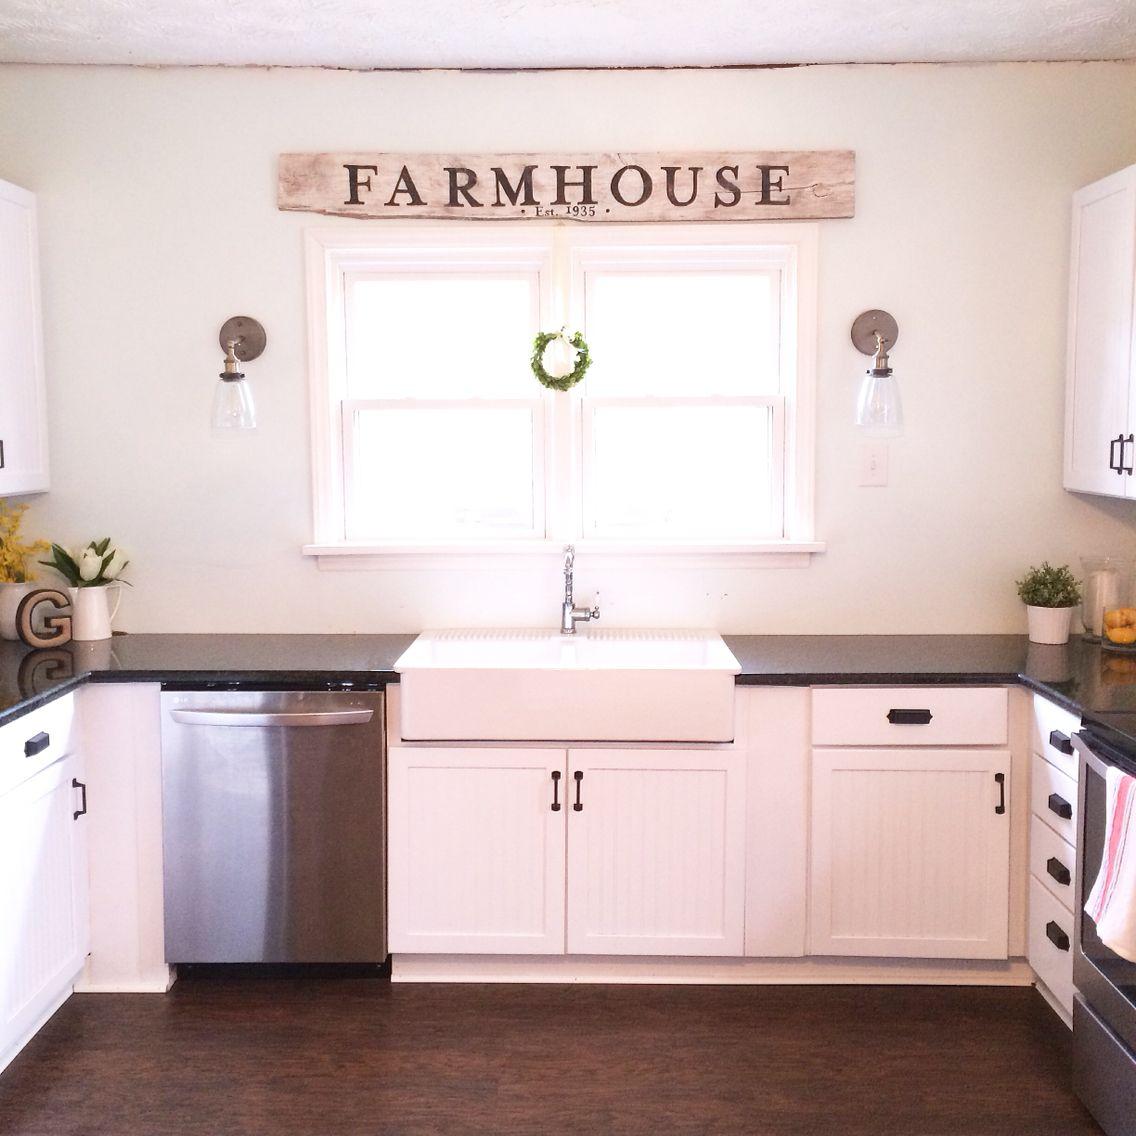 Farmhouse Kitchen Remodel With White Beadboard Cabinets Black Granite Apron Front Fa Cheap Kitchen Remodel Simple Kitchen Remodel Inexpensive Kitchen Remodel